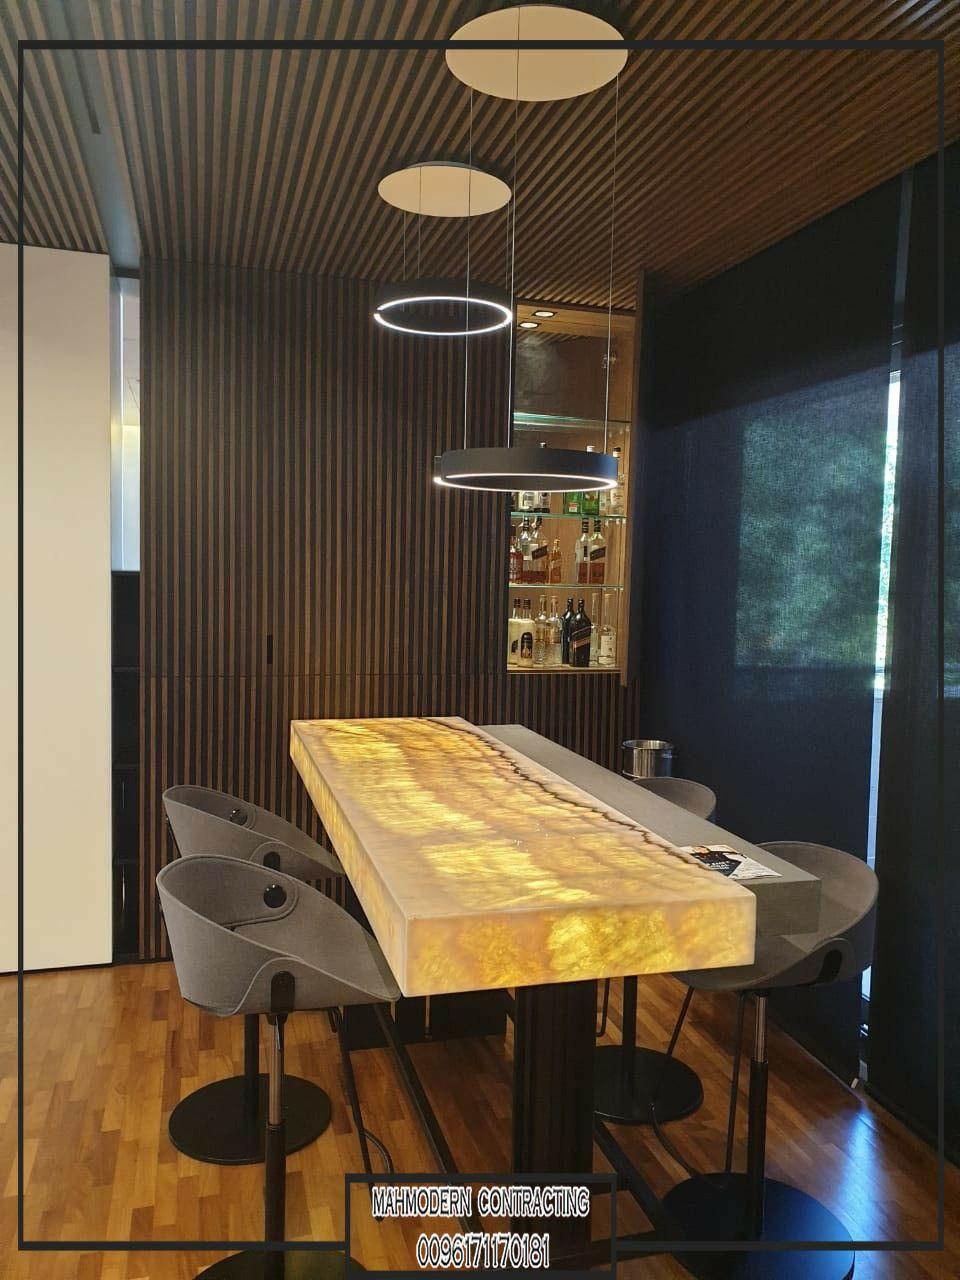 ديكور بار حديث اونيكس Onyx Onix شركة تنفيذ ديكور داخلي مودرن 0096171170181 Whwhatsapp Contracting Home Decor Decor Decor Design